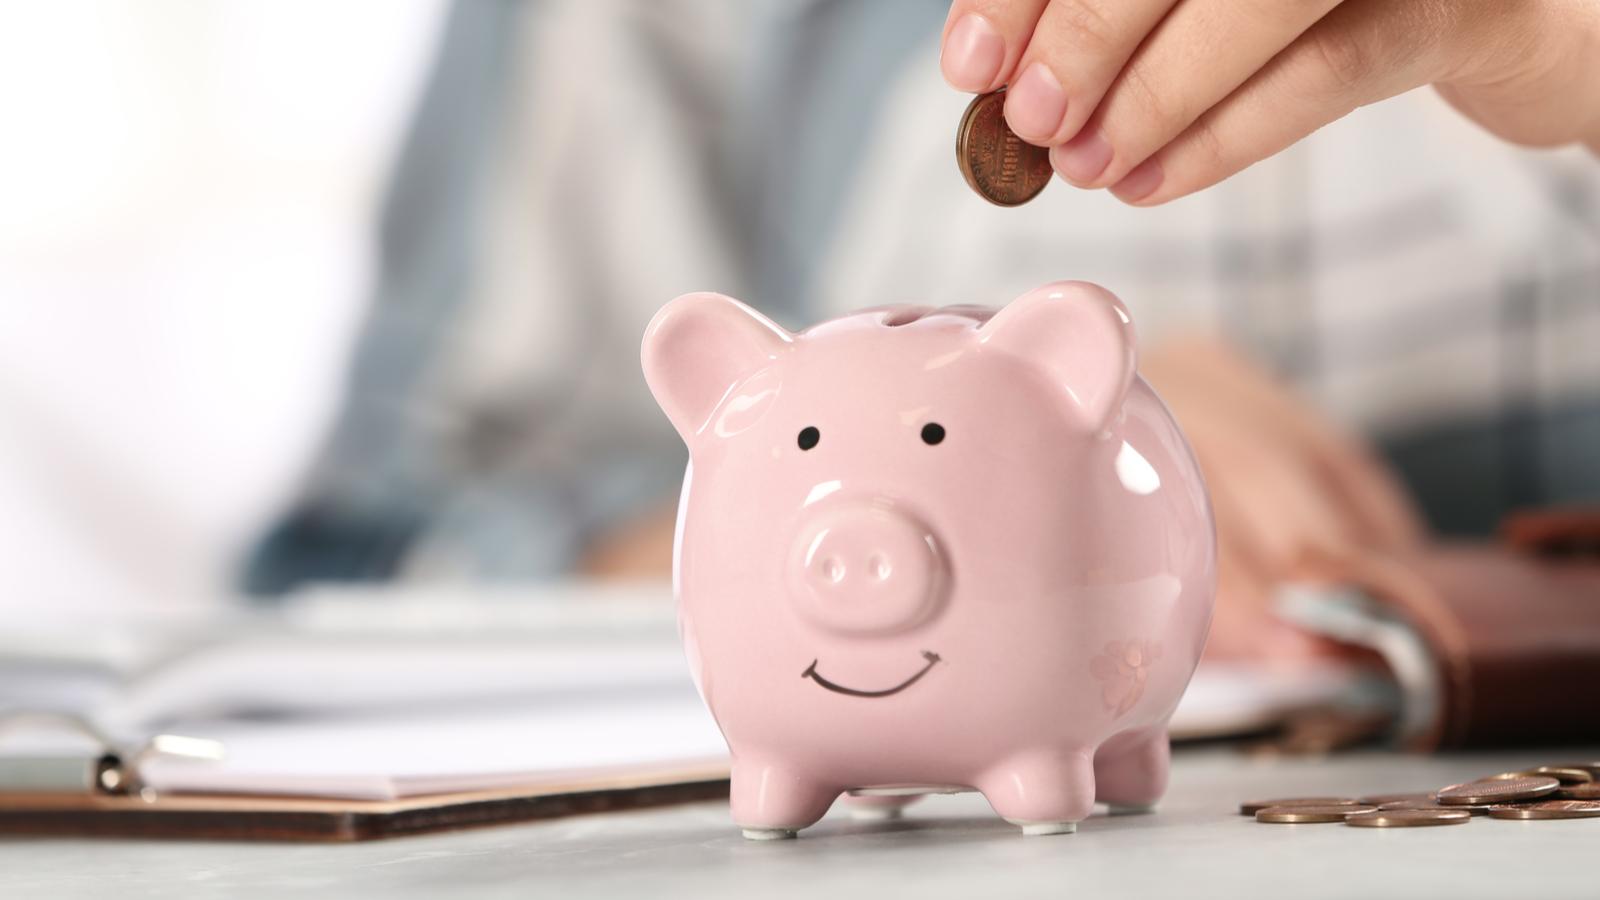 A woman putting money into a piggy bank